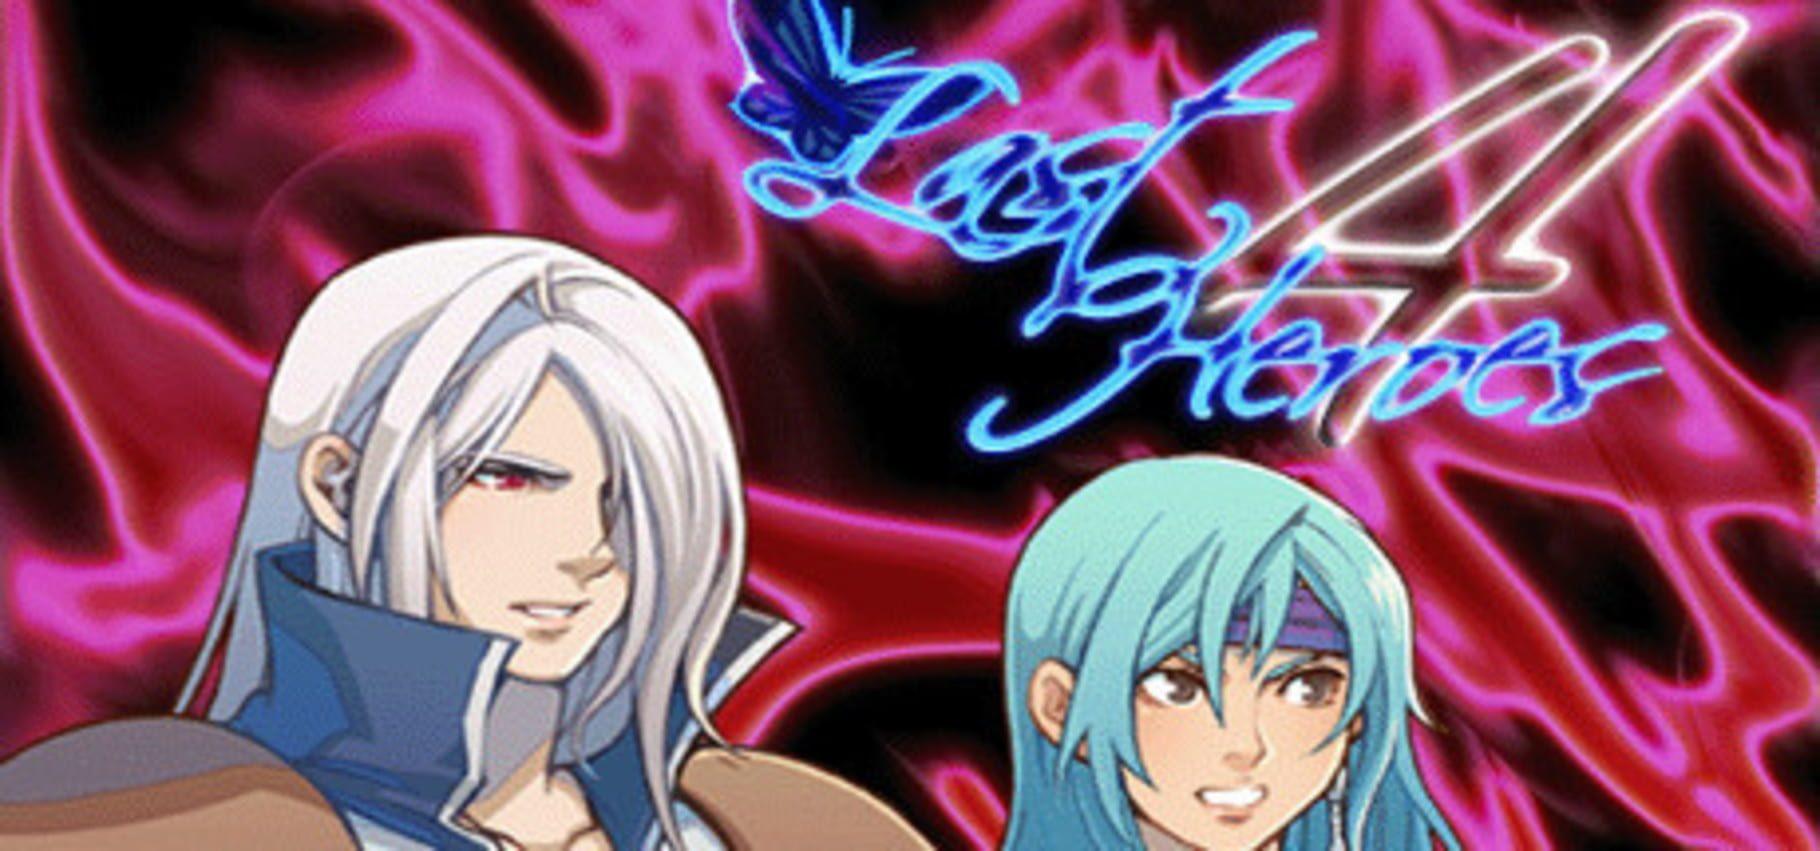 buy Last Heroes 4 cd key for all platform